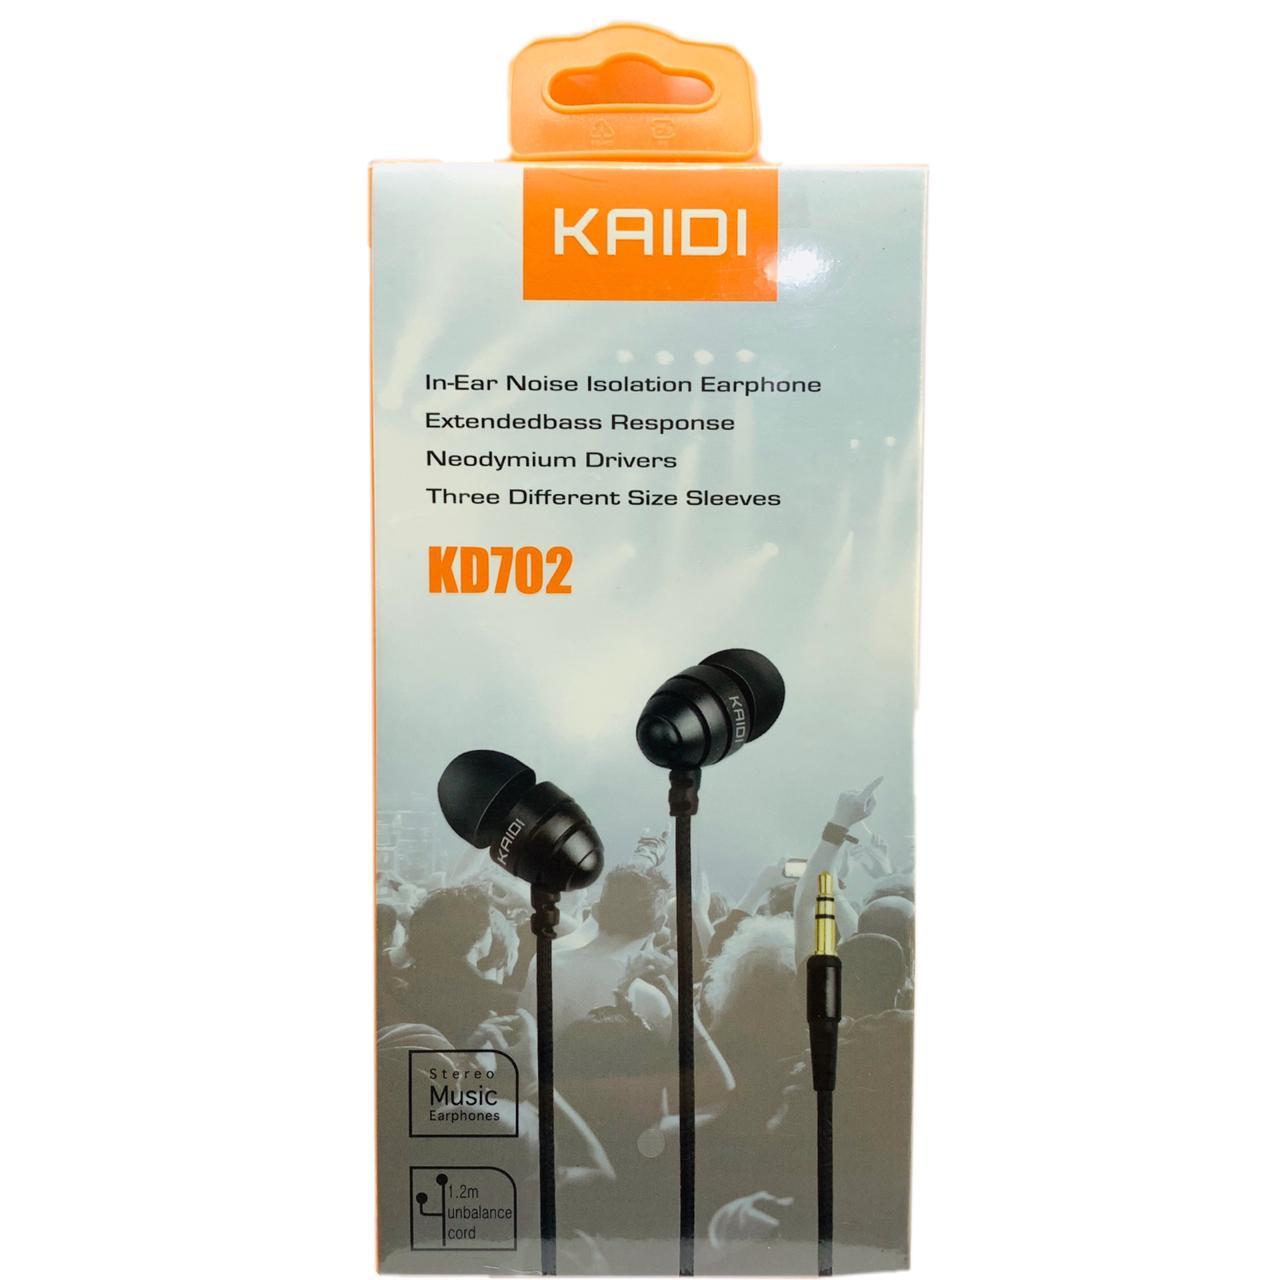 Fone de Ouvido KAIDI KD702